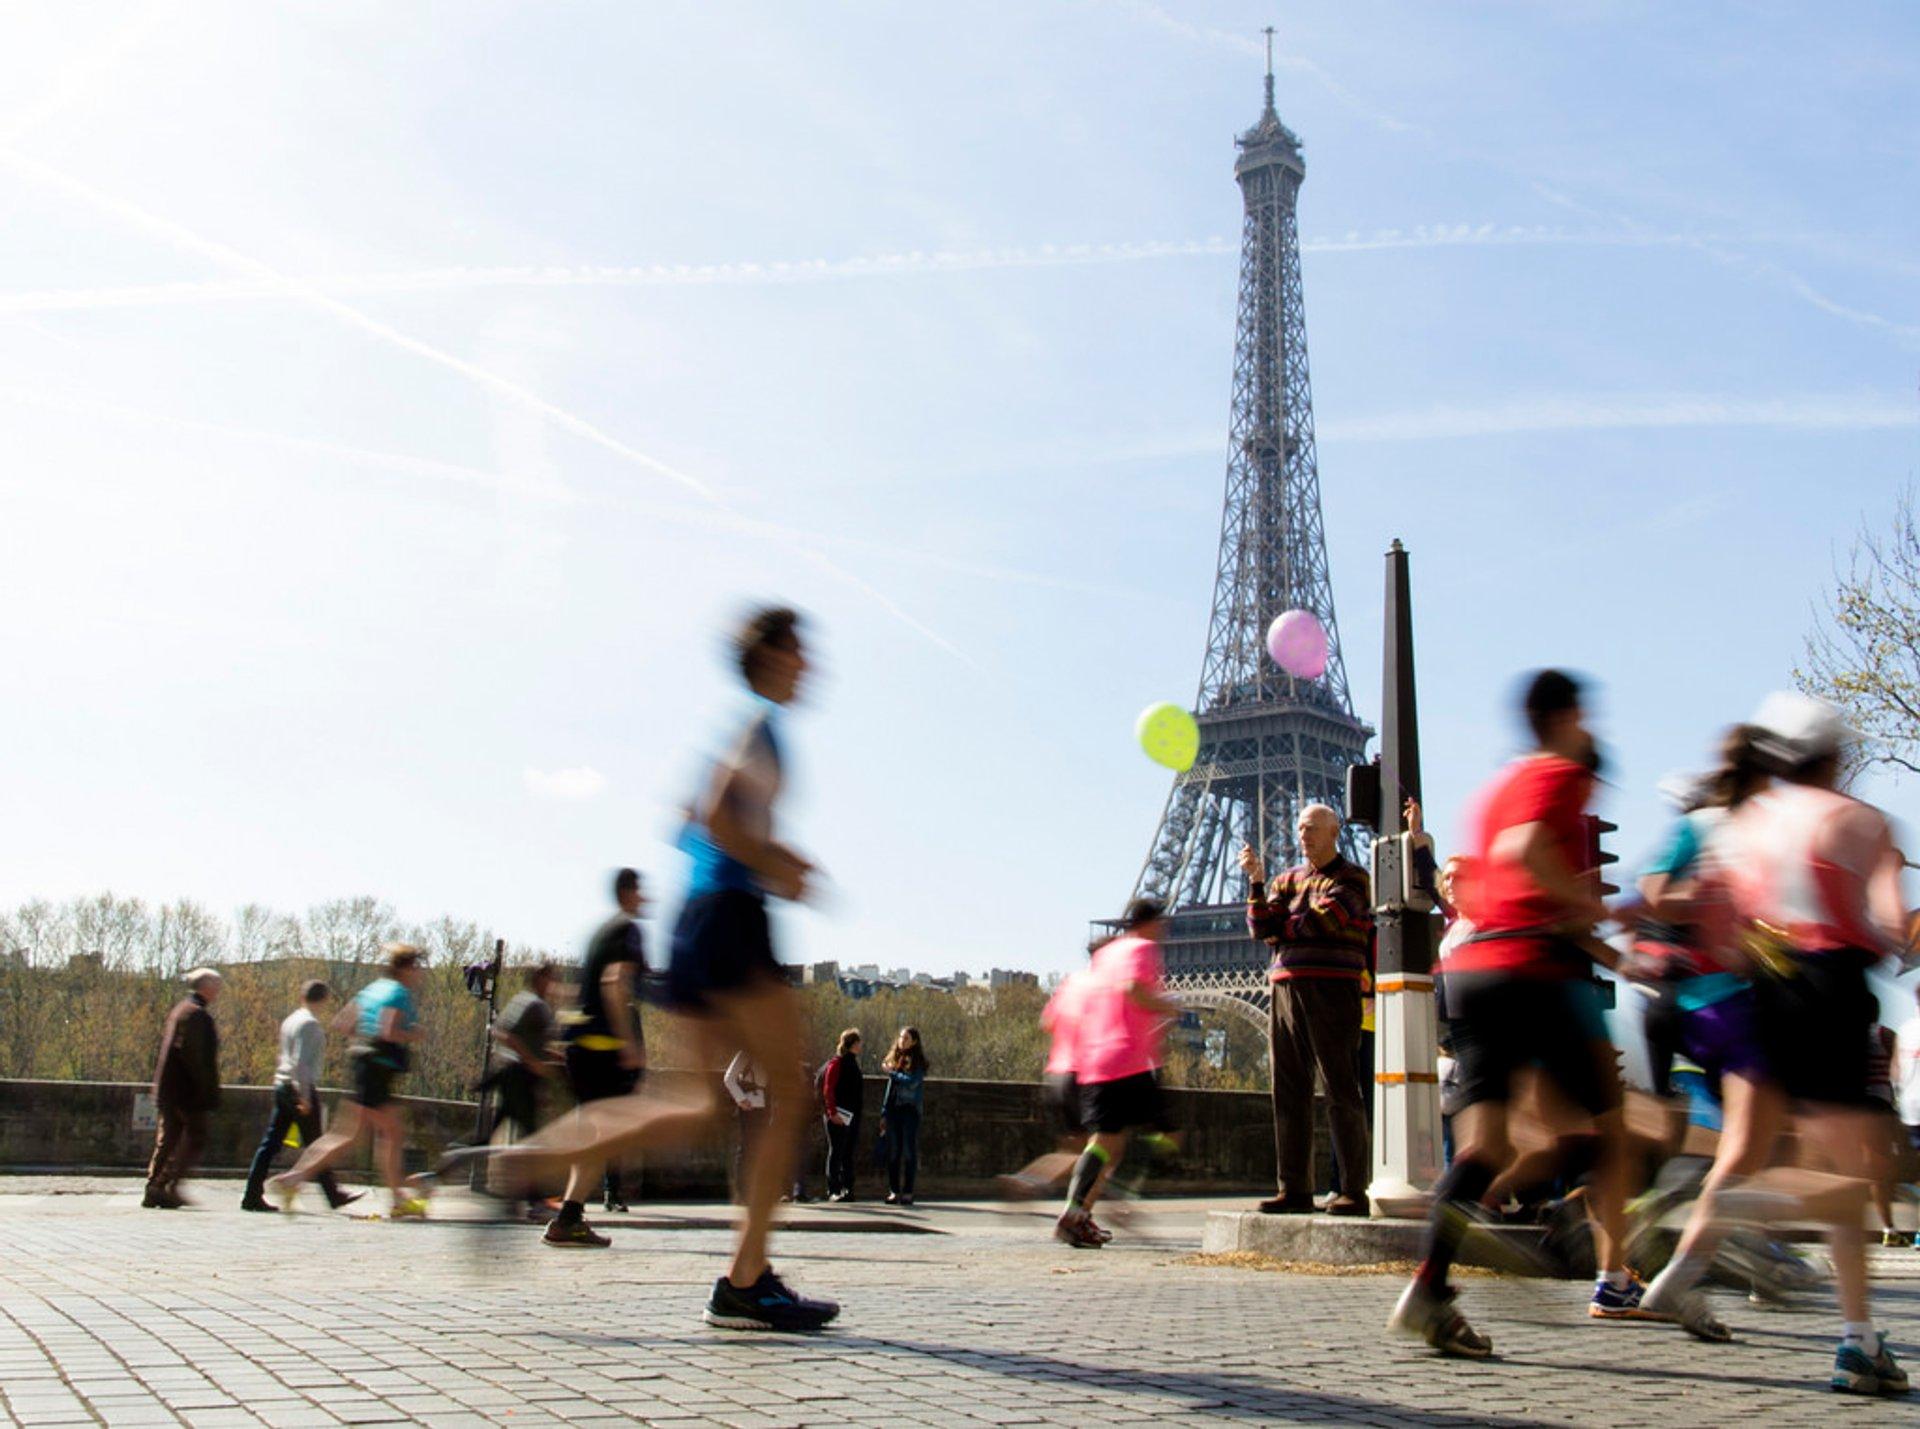 Marathon de Paris in Paris 2020 - Best Time